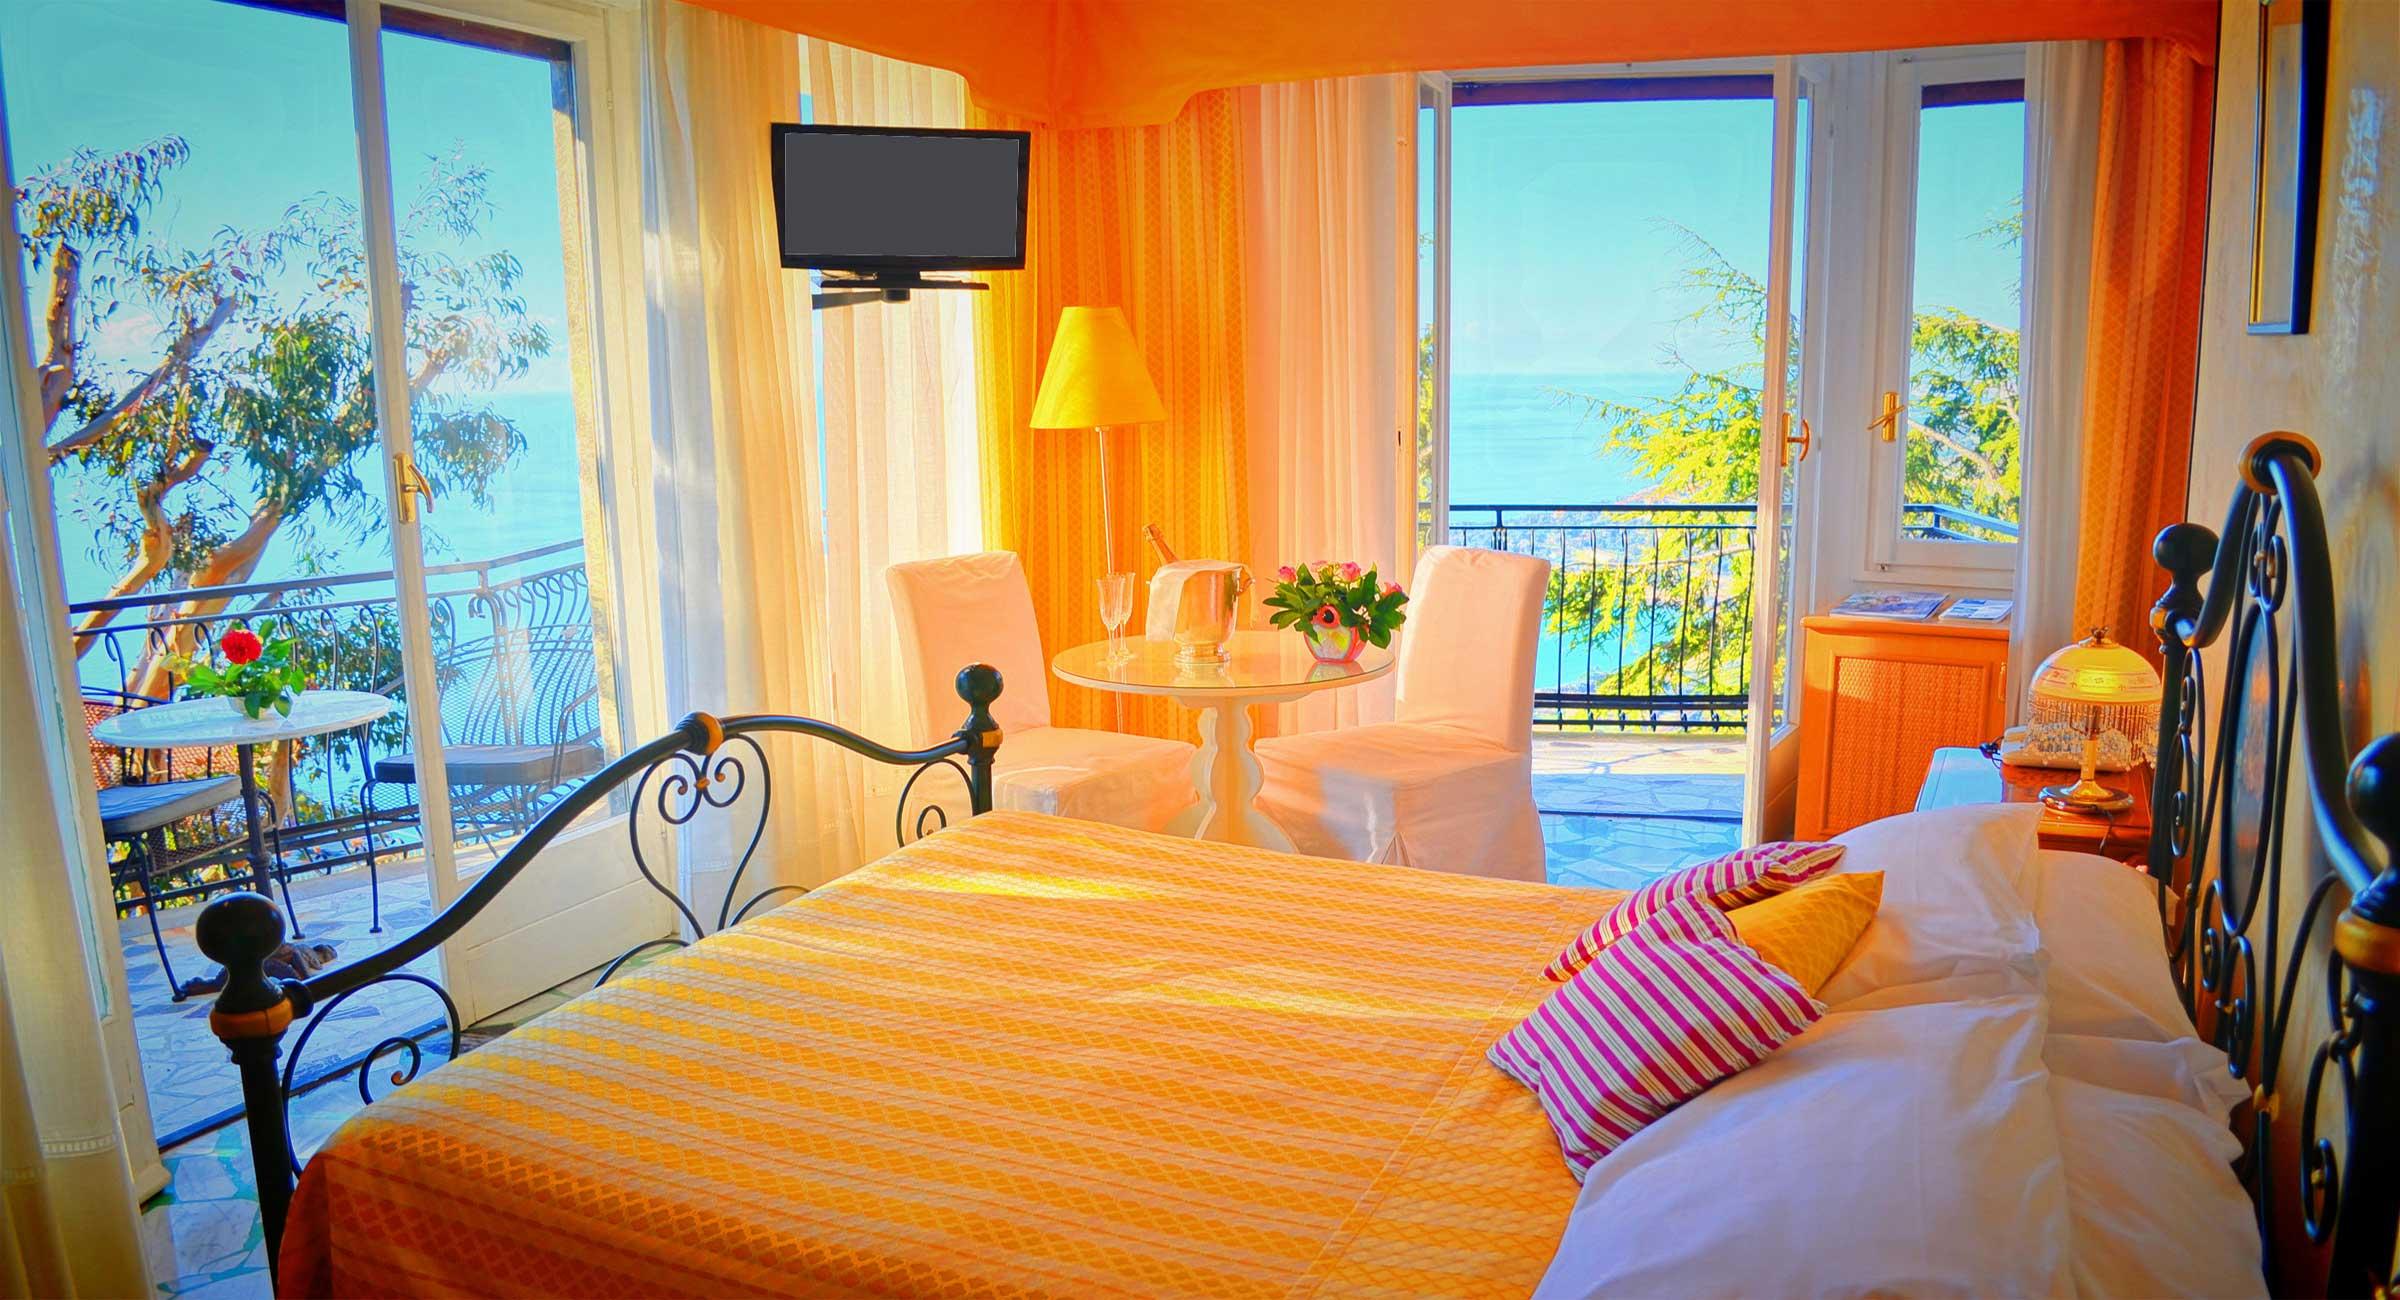 Les chambres d'hôtel